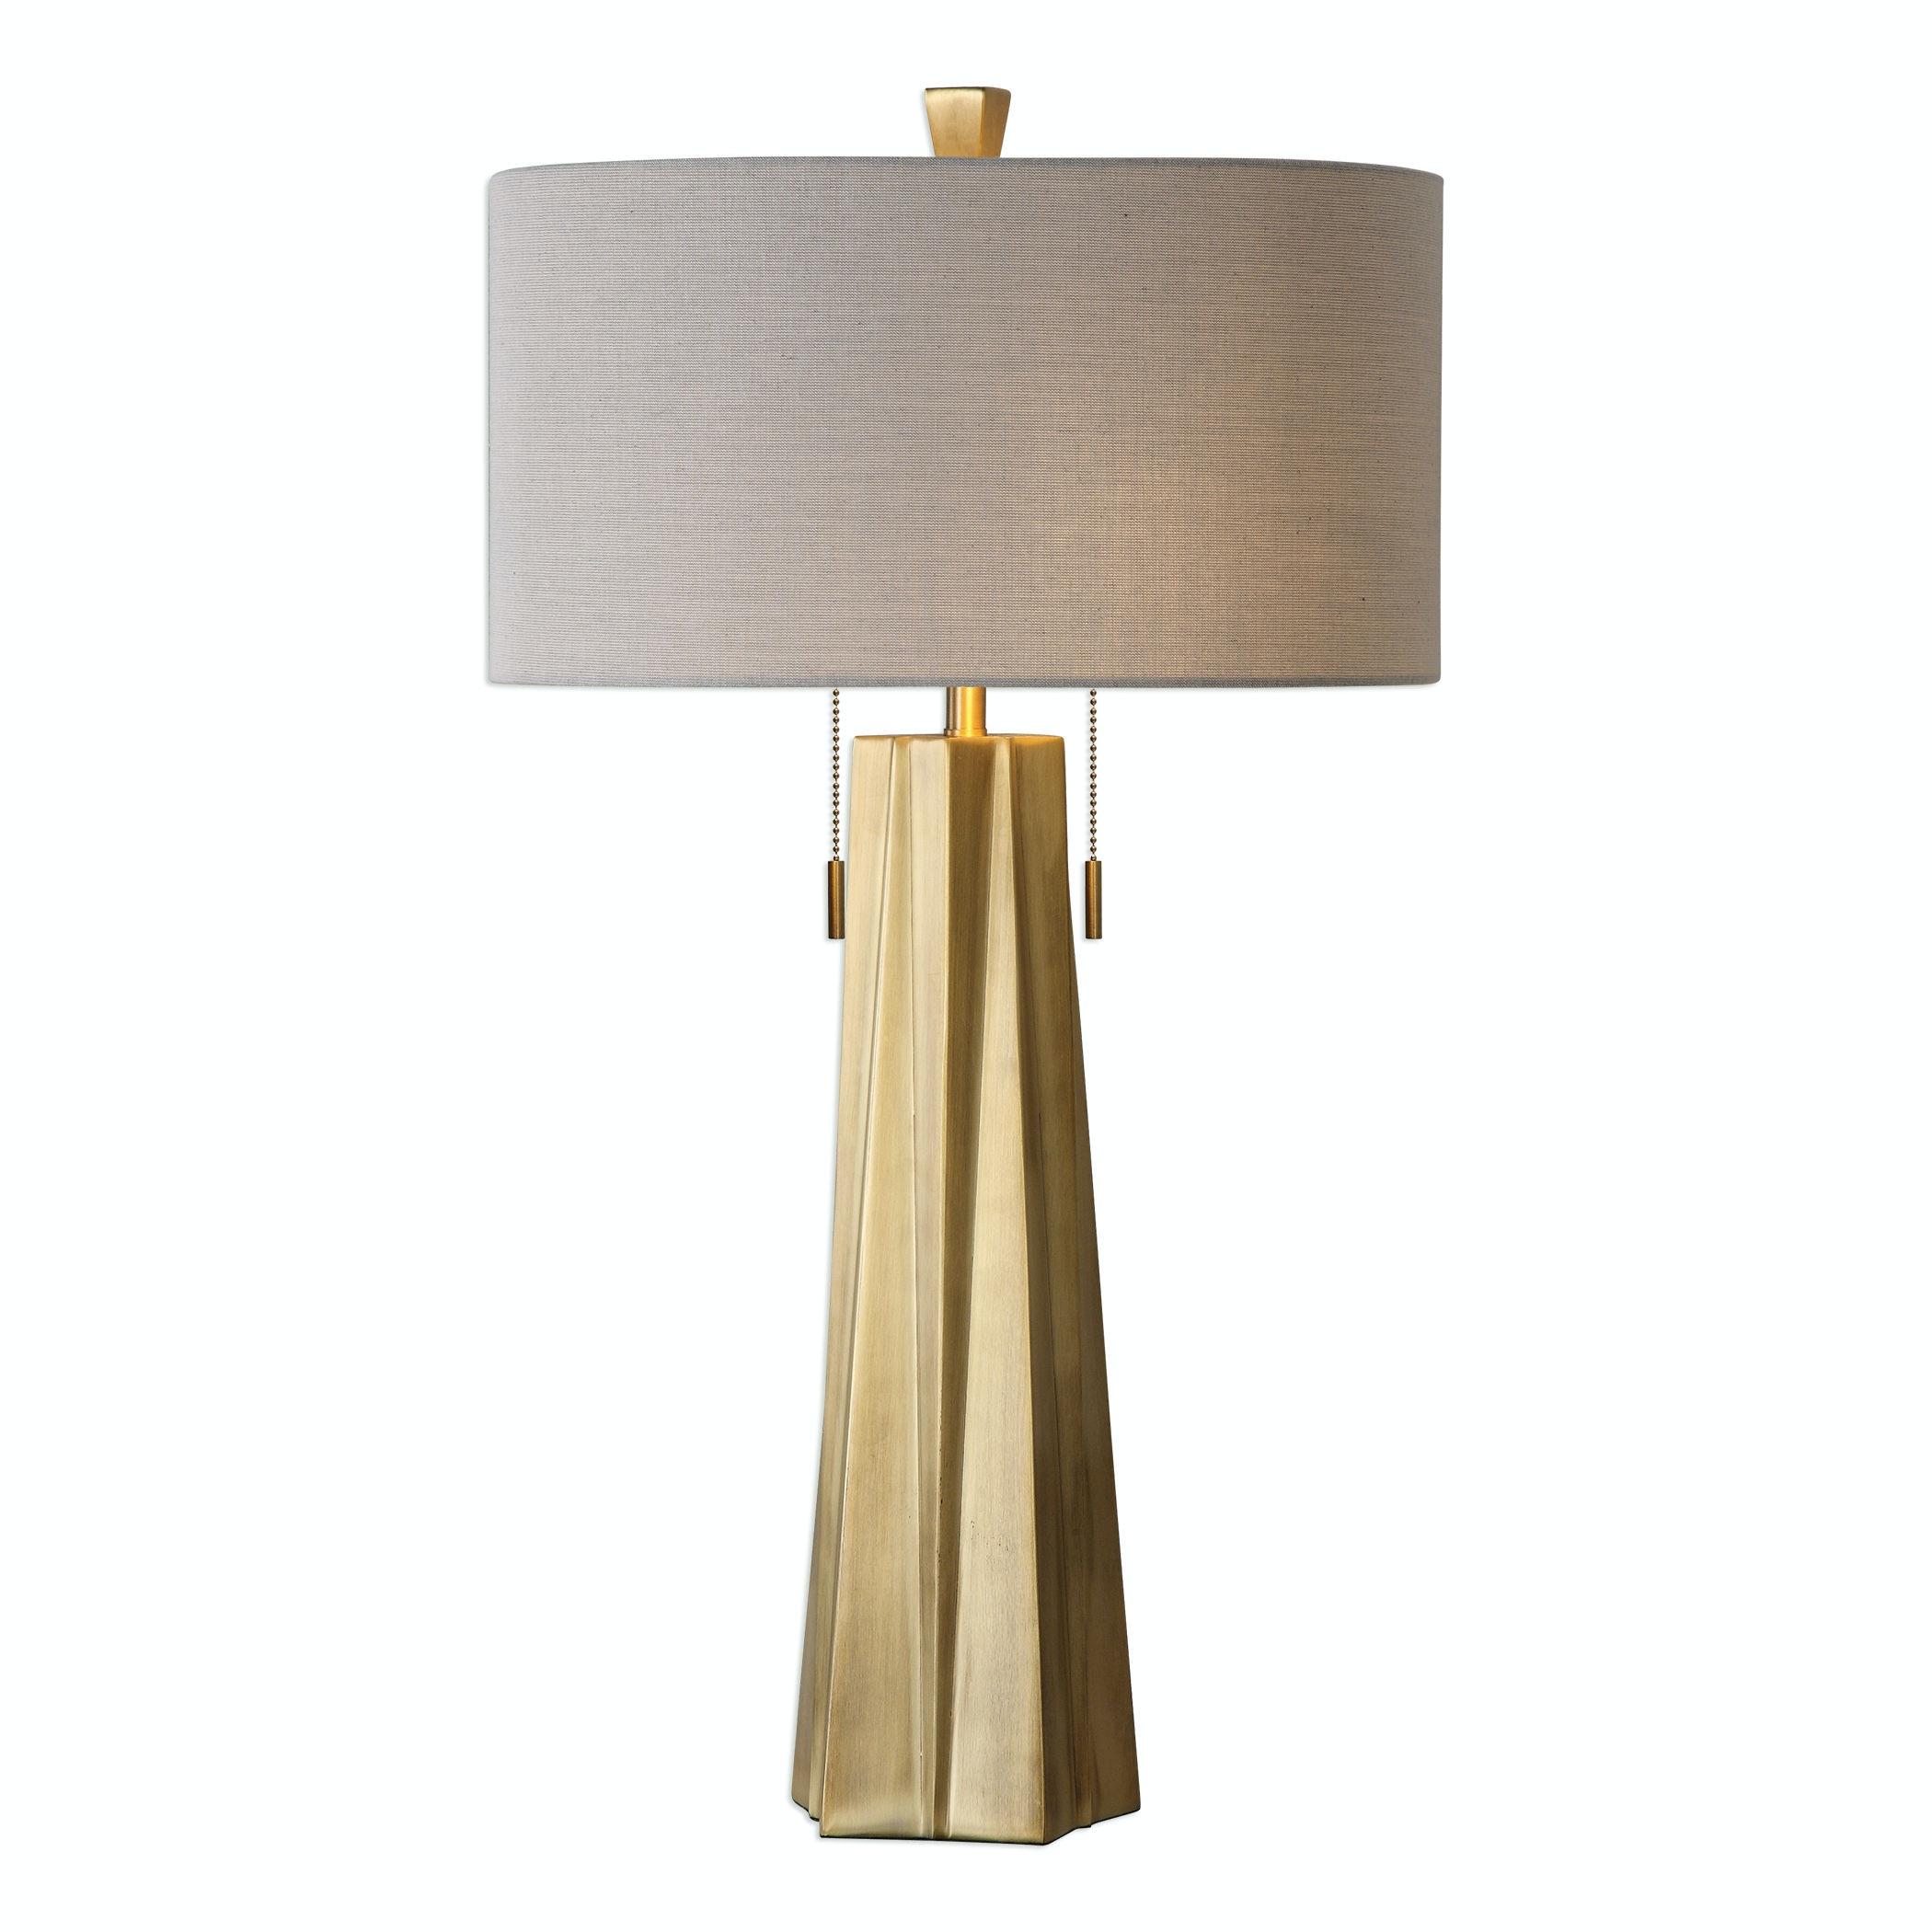 Uttermost Maris Gold Table Lamp